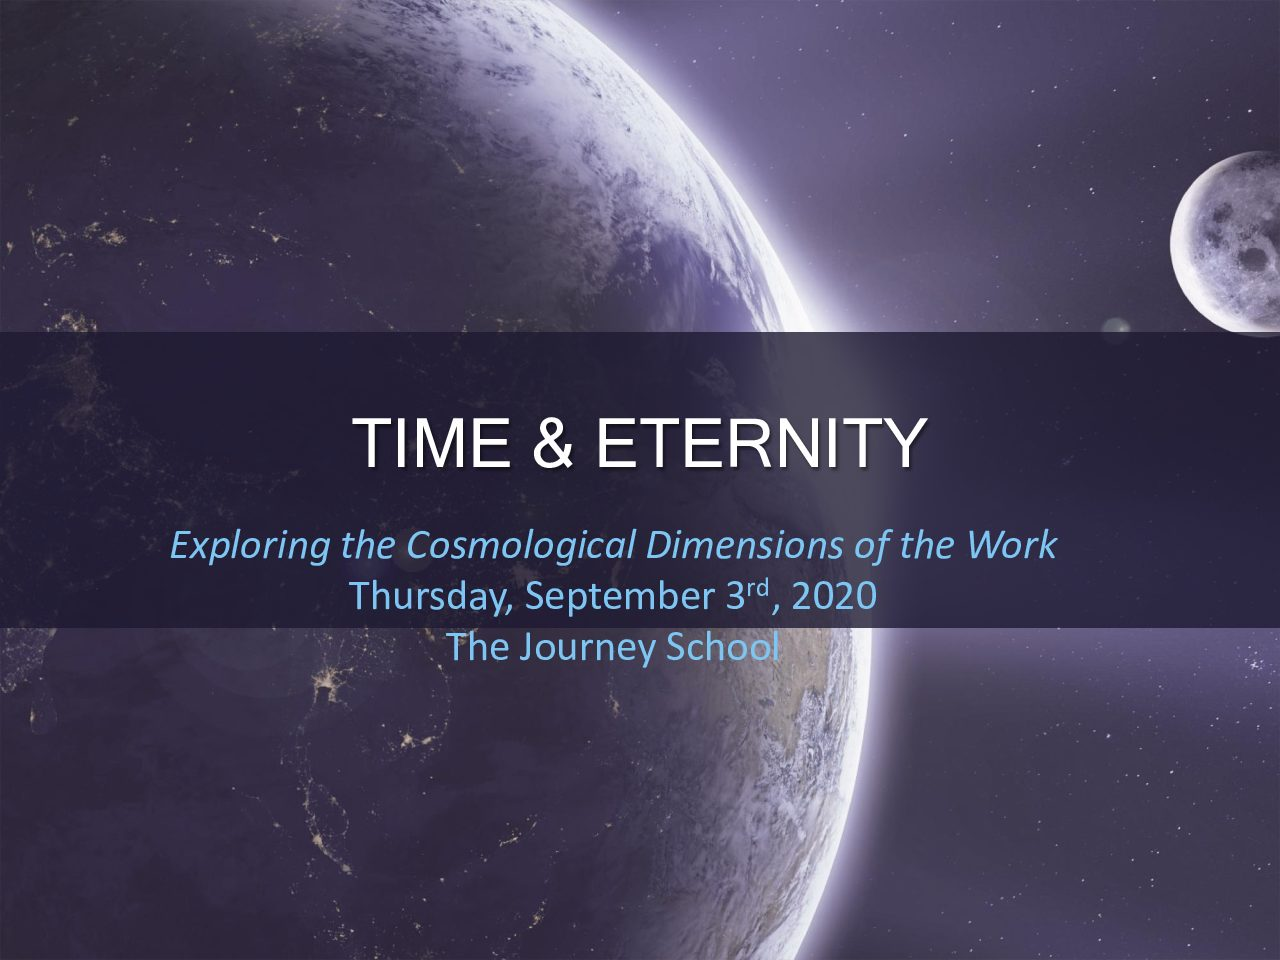 2020_TJS34_time & eternity